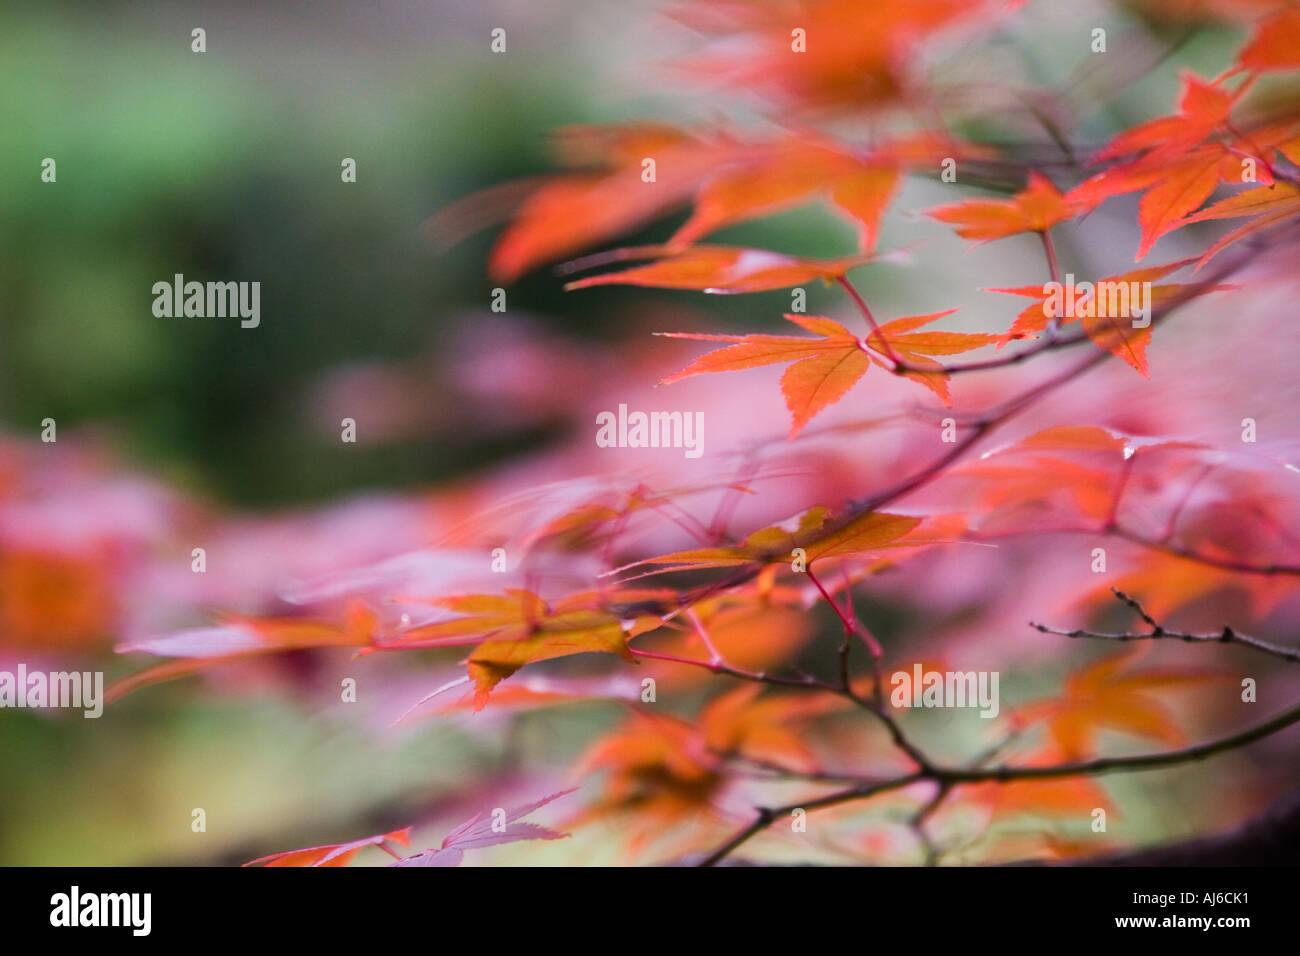 Japanese maple (Acer palmatum) detail in autumn colors at Daisen-in Temple, Daitokuji Temple, Kyoto, Kansai Region, Japan - Stock Image